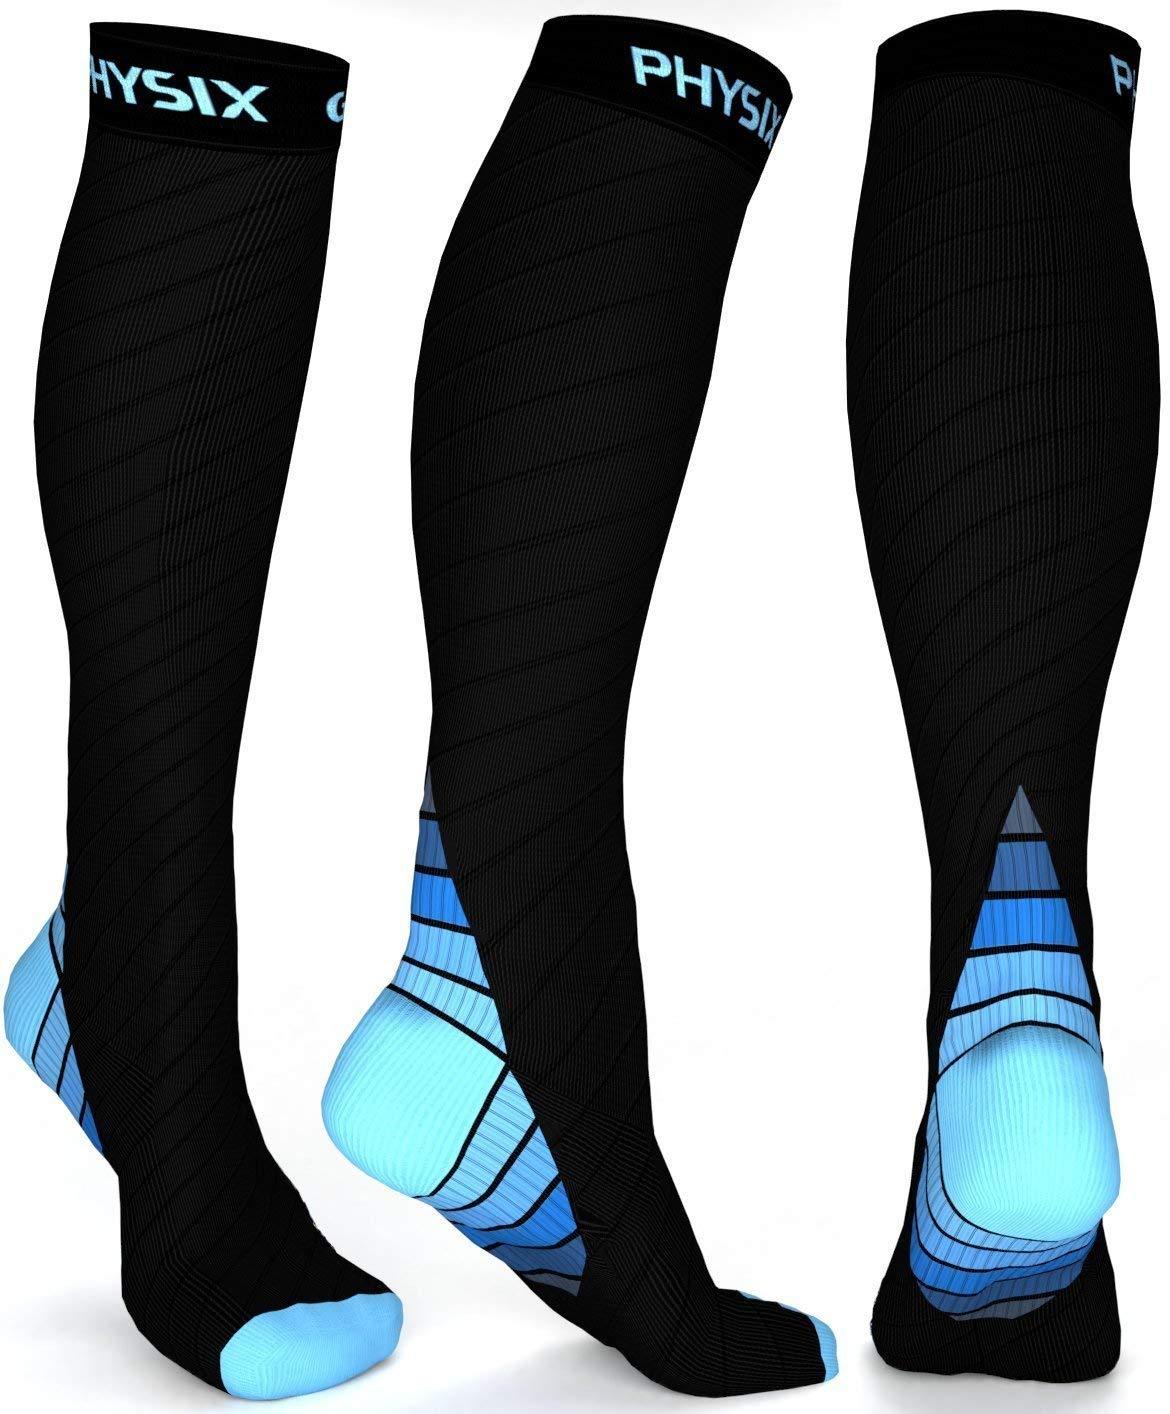 Physix Gearコンプレッションソックス男性用/女性用(2030 mmHg)最高の段階的なフィット ランニング、看護、過労性脛部痛、フライトトラベル&マタニティ妊娠 – スタミナ、循環&回復 (BLACK & BLUE S-M) B01J4MF5UY